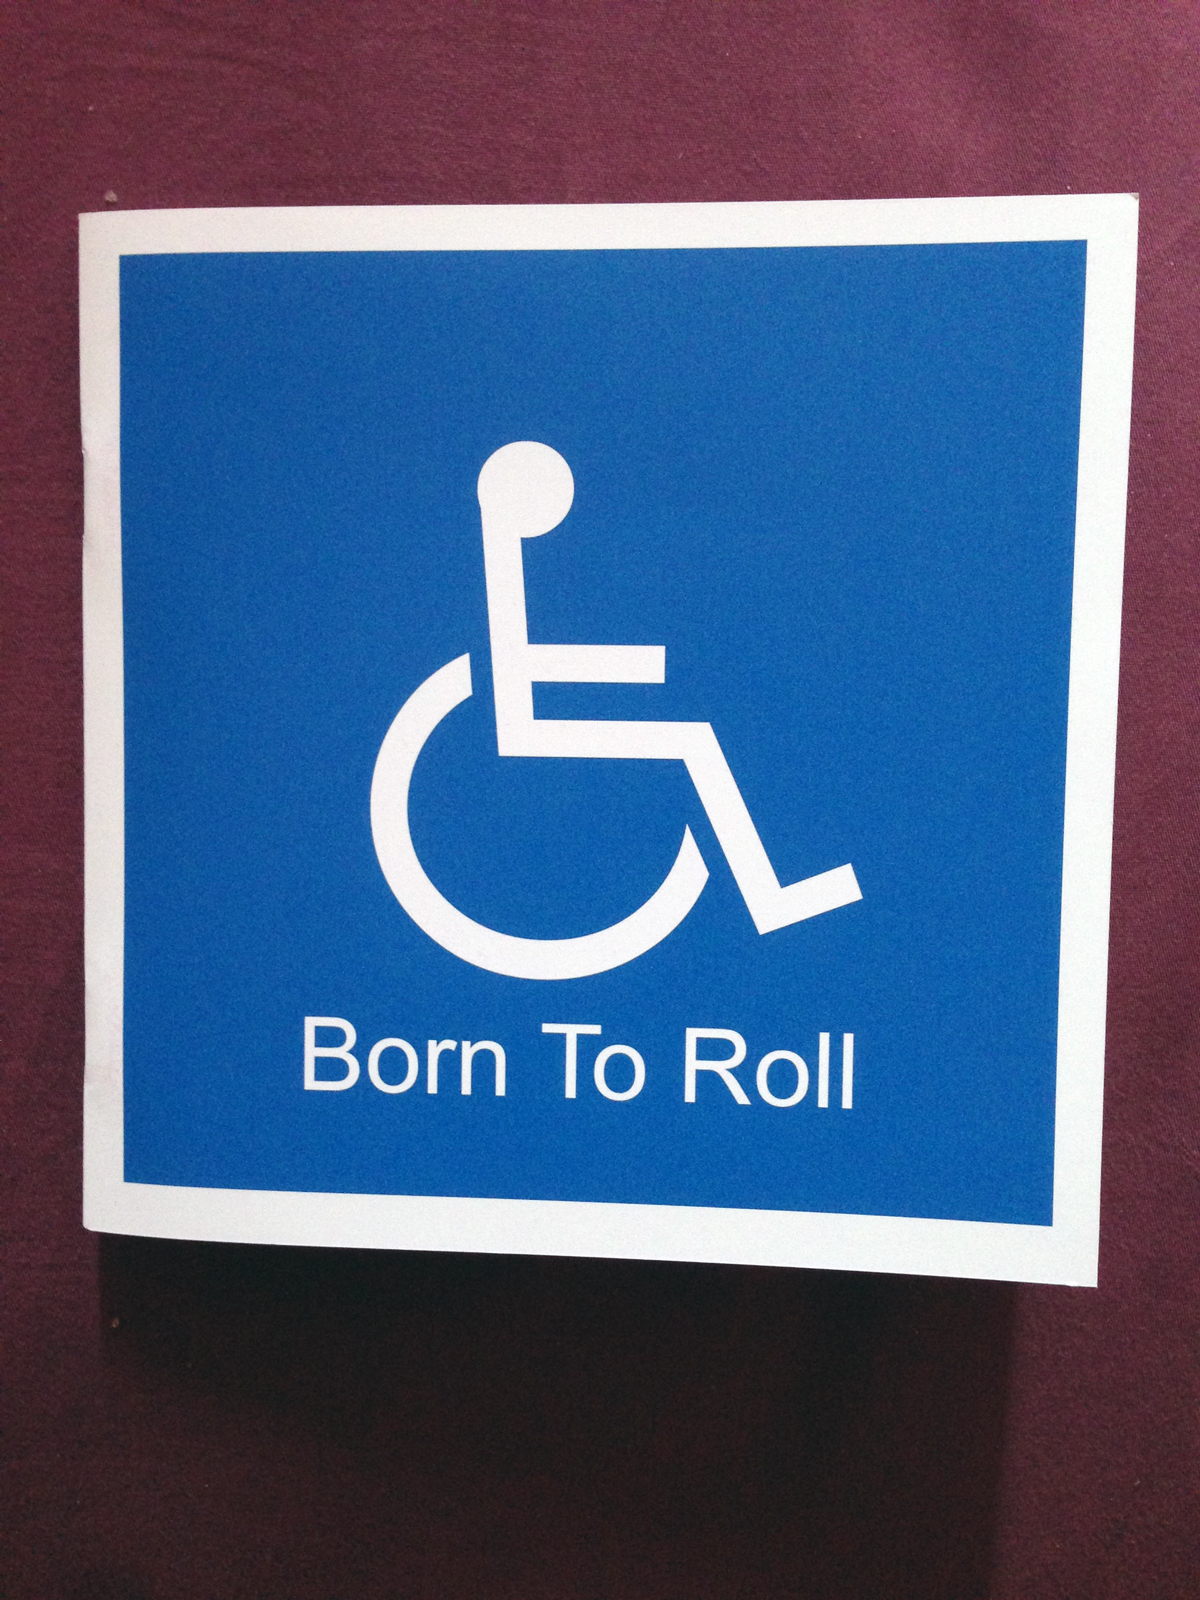 borntorollcoversm.jpg